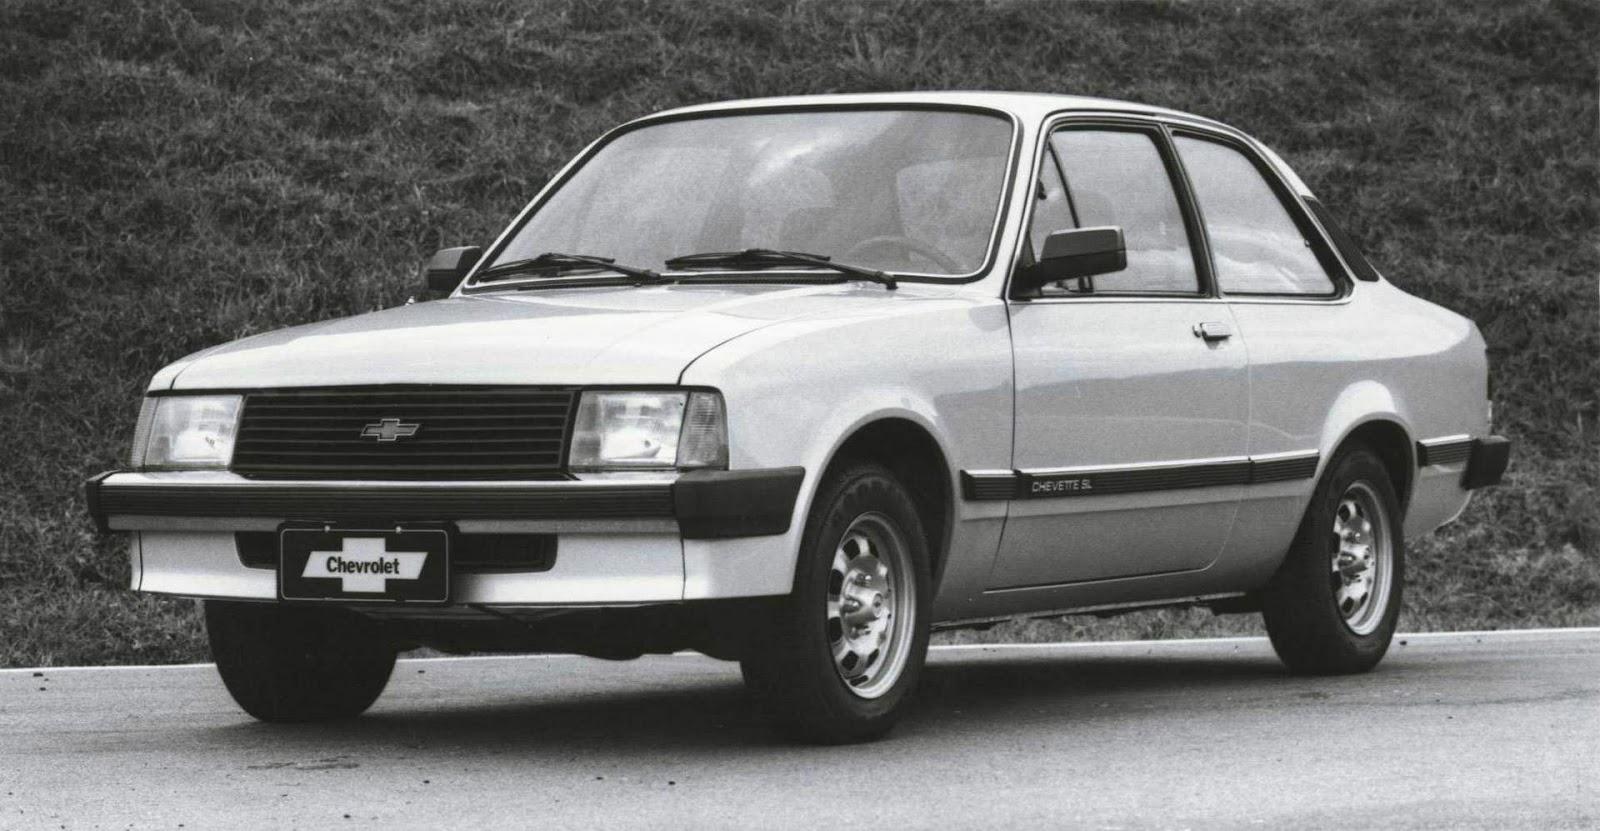 Chevrolet j vendeu 15 milh es de ve culos no brasil car for Chevette 4 portas